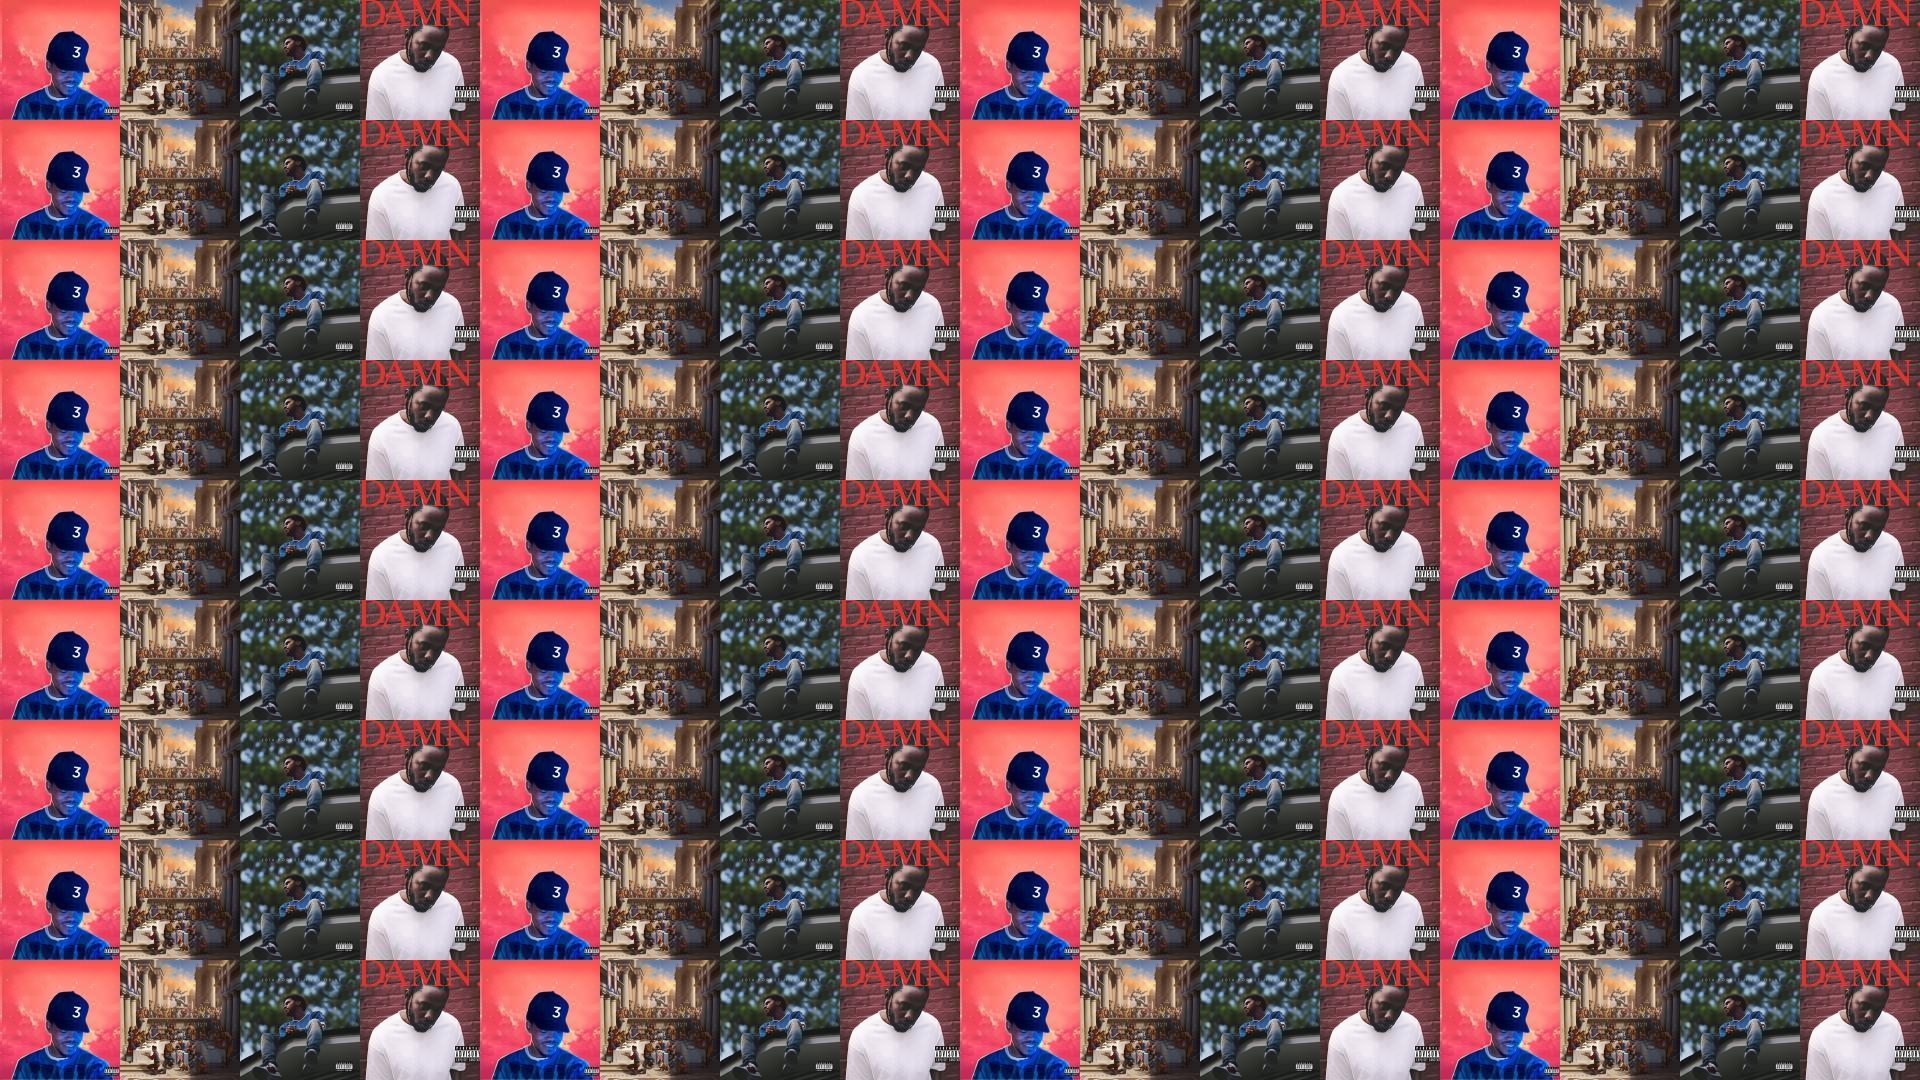 Chance Rapper Coloring Book Logic Everybody J Cole Wallpaper Â« Tiled  Desktop Wallpaper